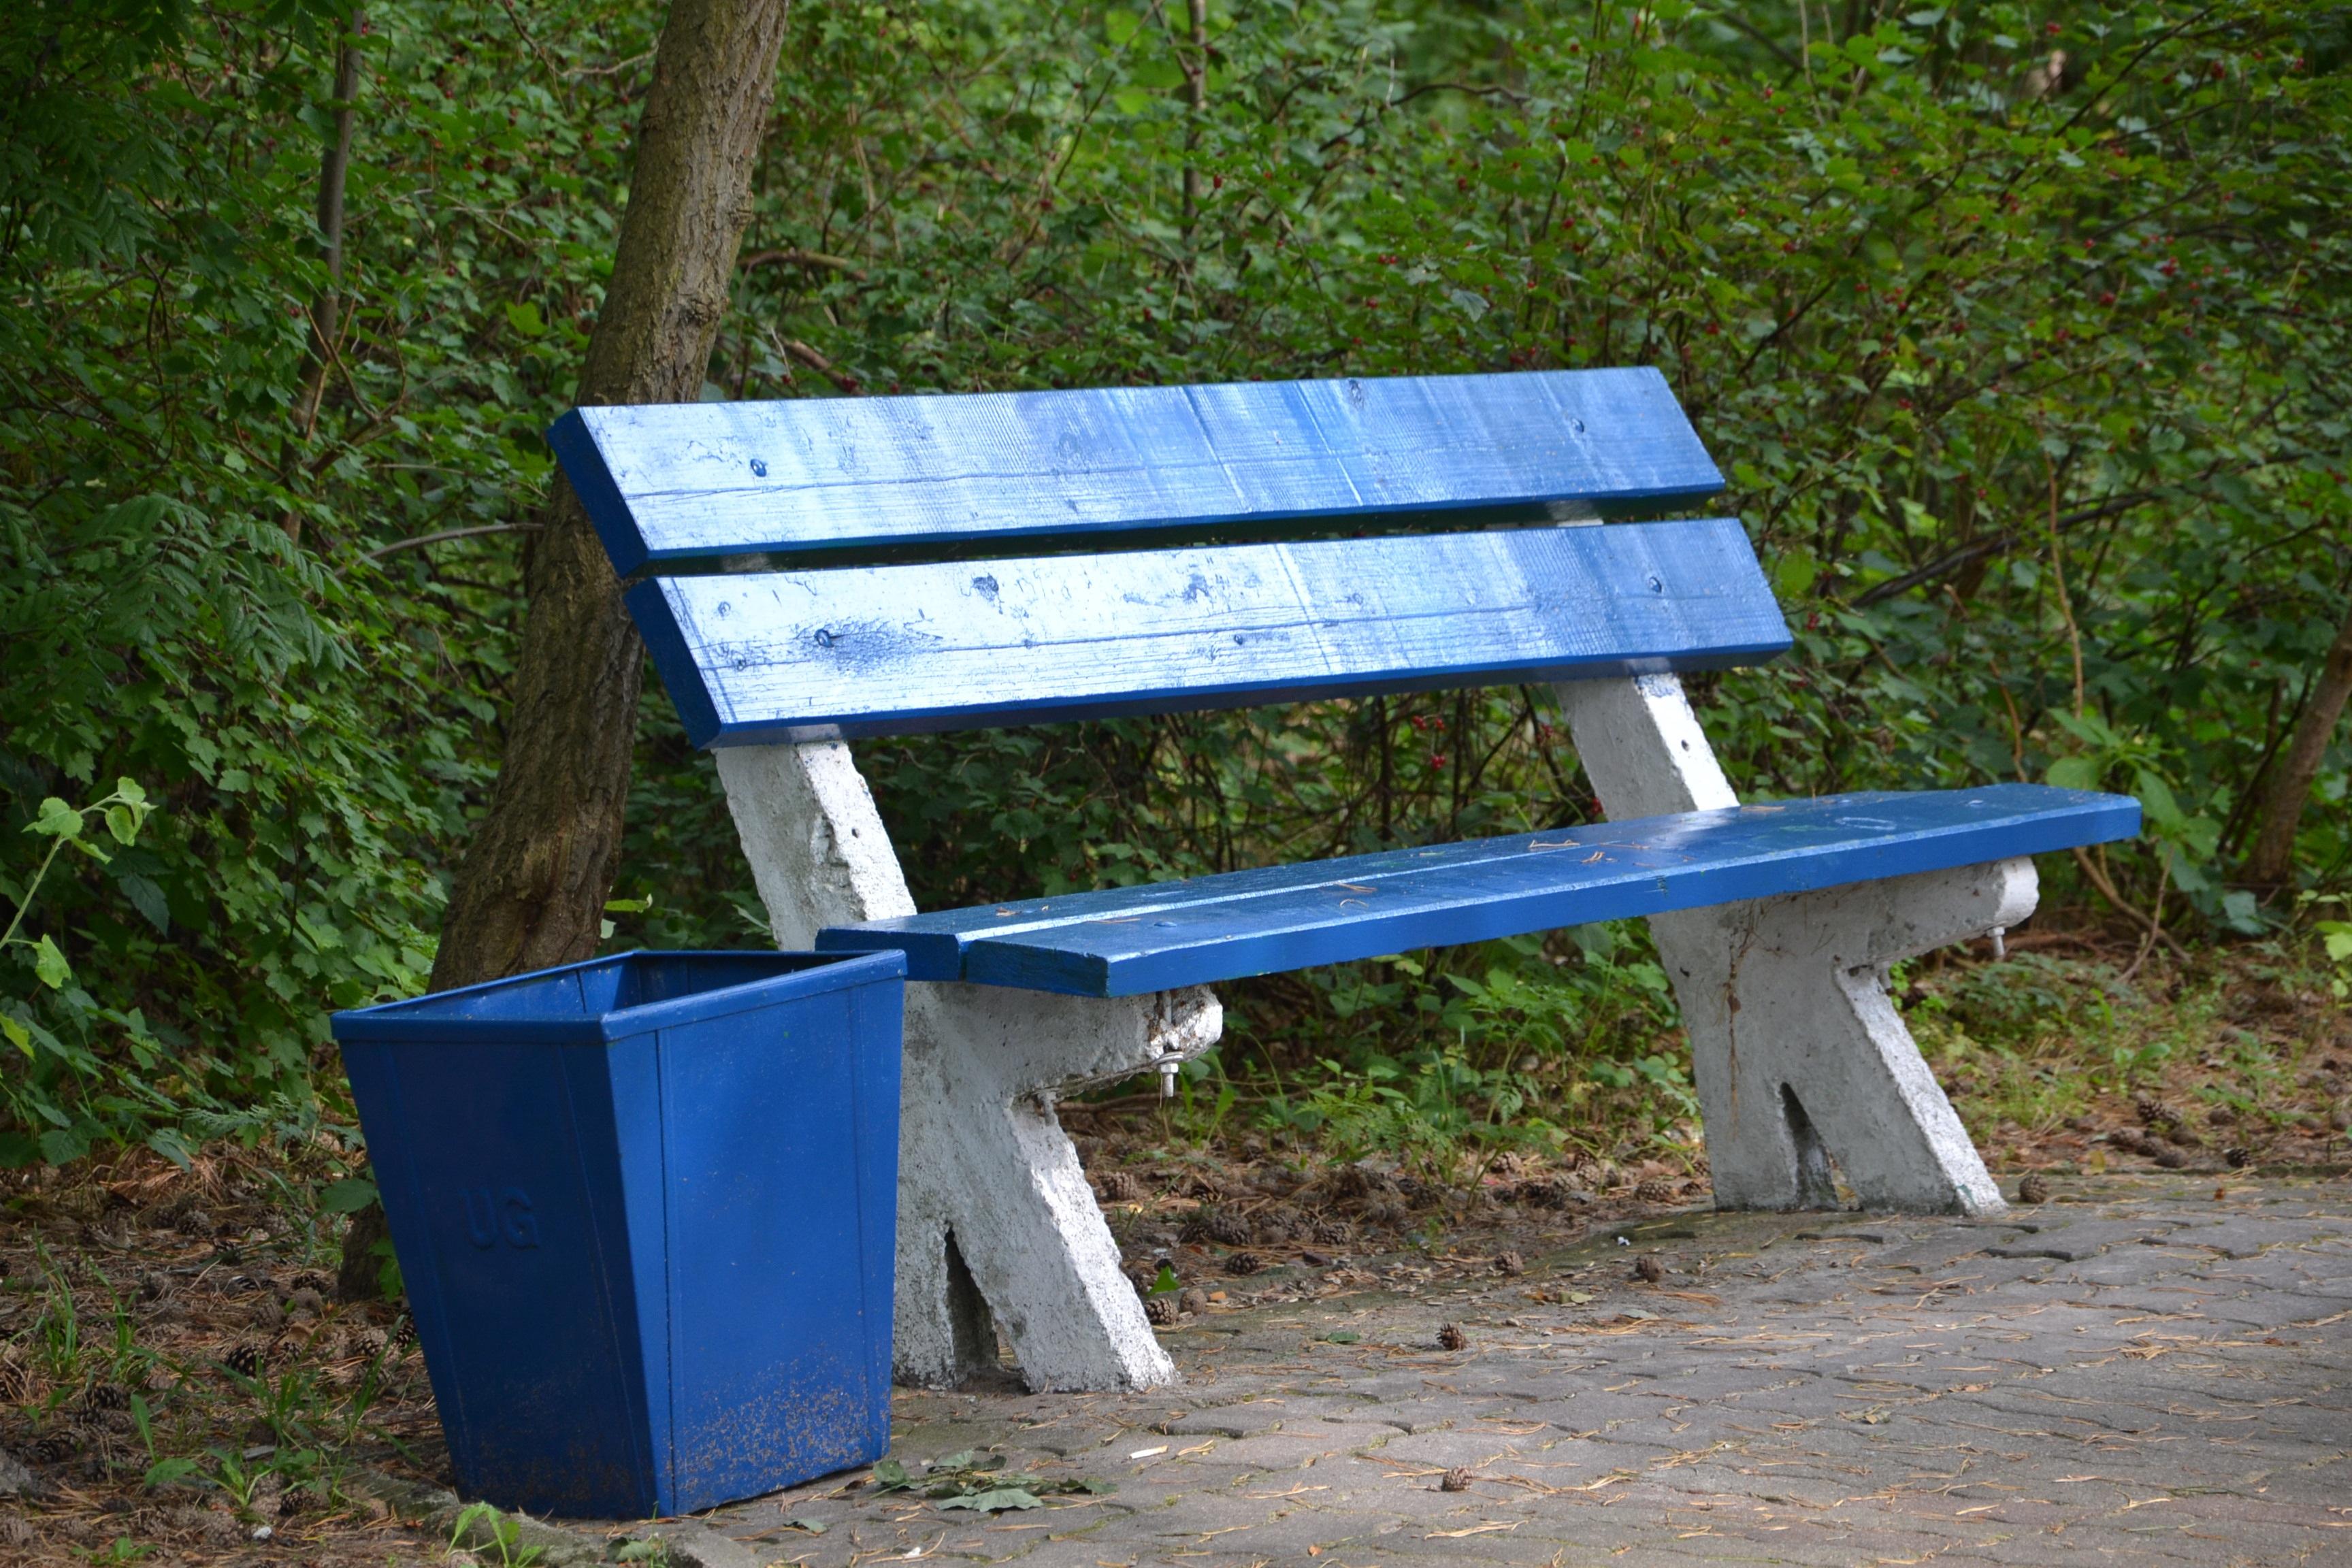 Fotos gratis : mesa, árbol, banco, parque, azul, descanso, mueble ...